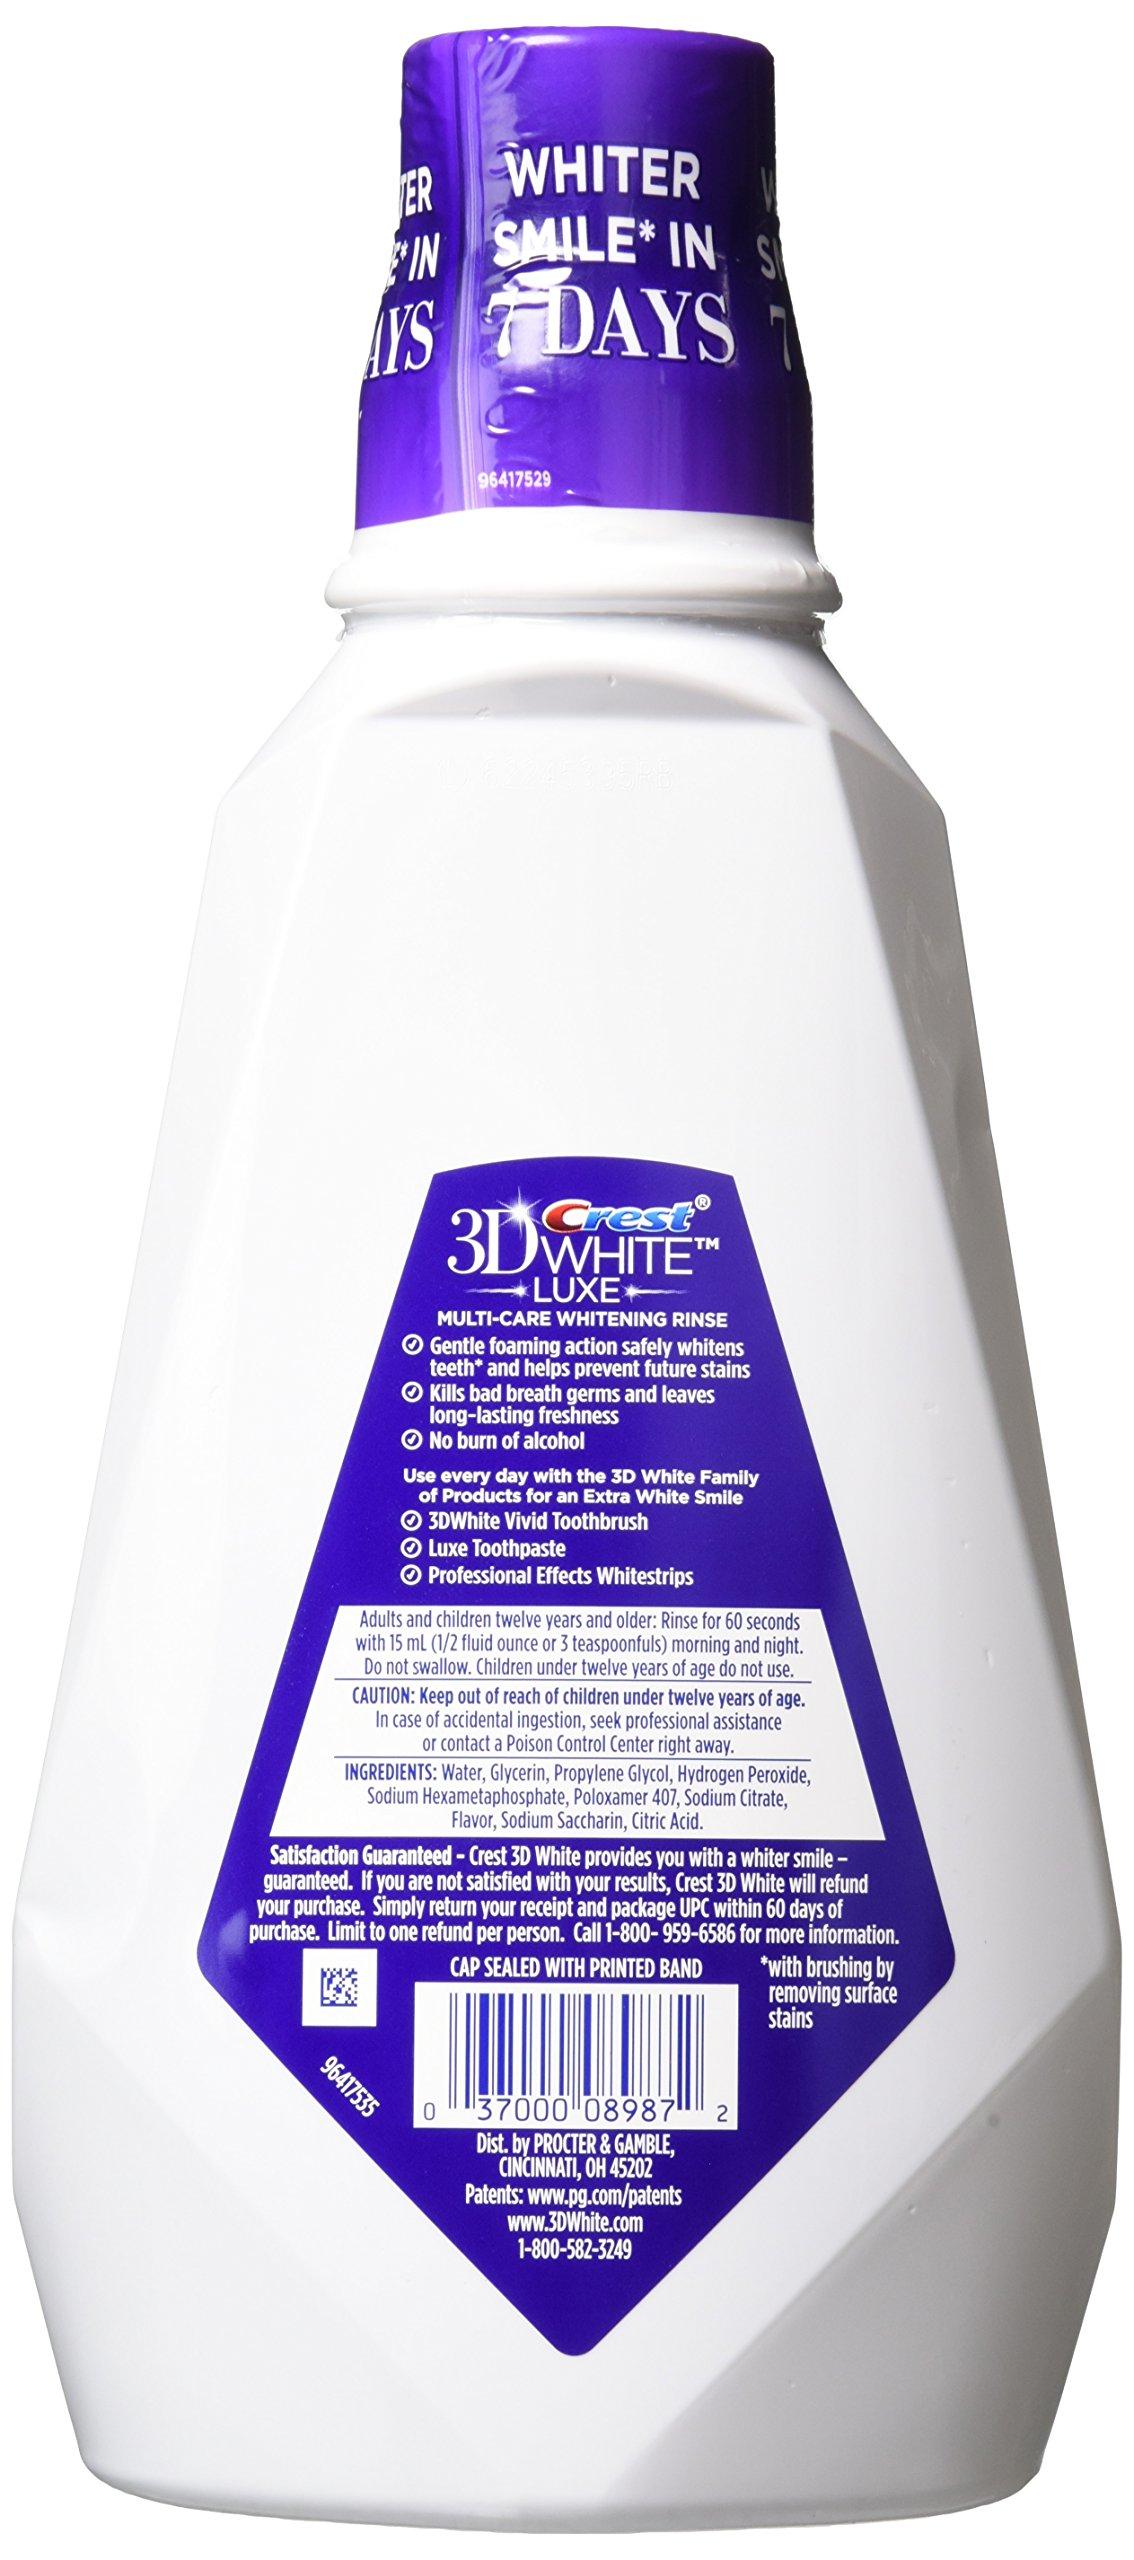 Crest 3D White Multi-Care Whitening Rinse, Glamorous White, Fresh Mint-32 oz, 946 milliter